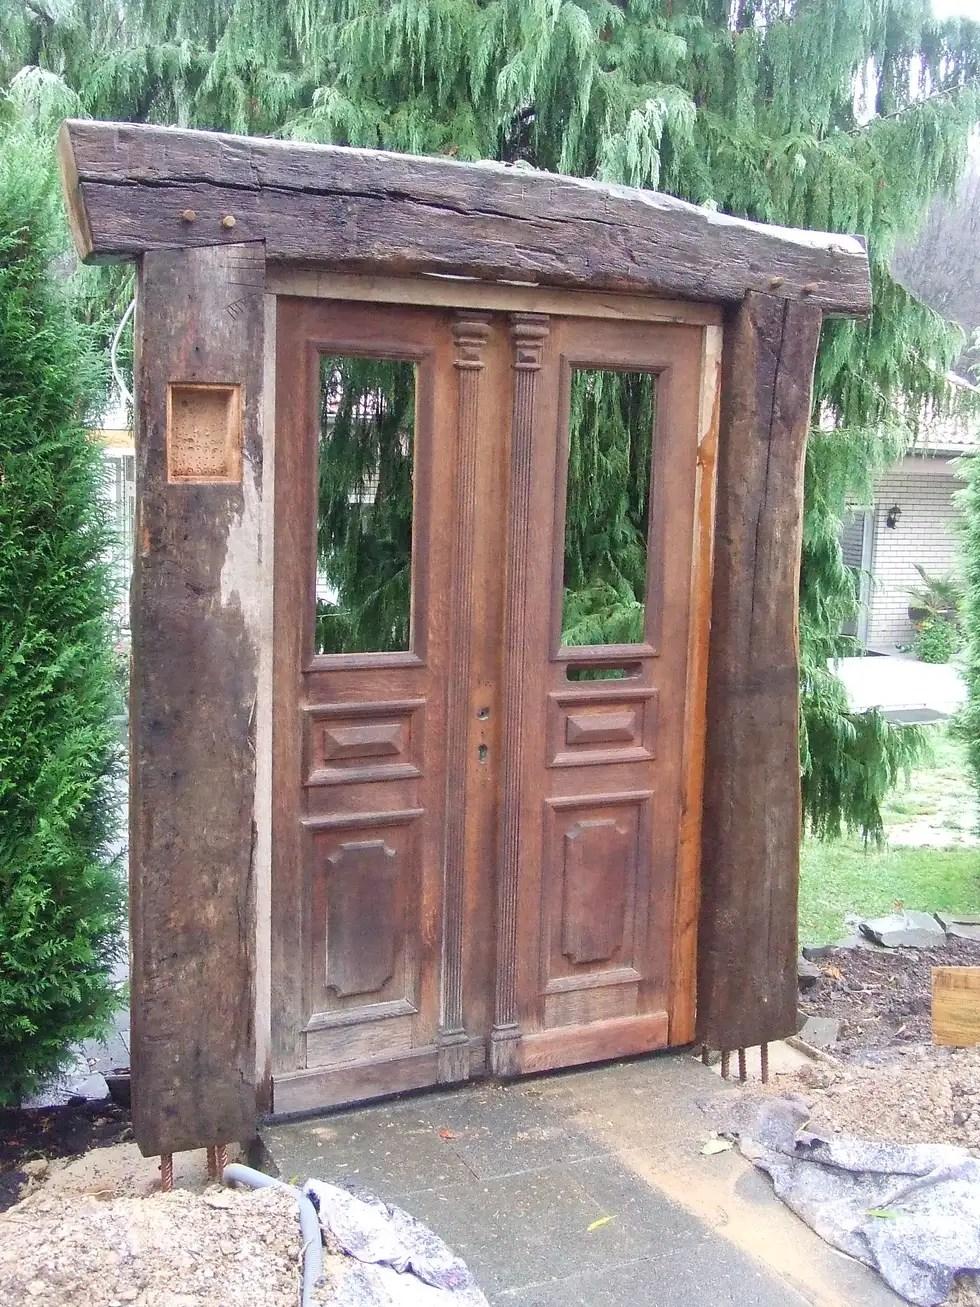 Garten gestaltung, fachwerk bau, recycled holz